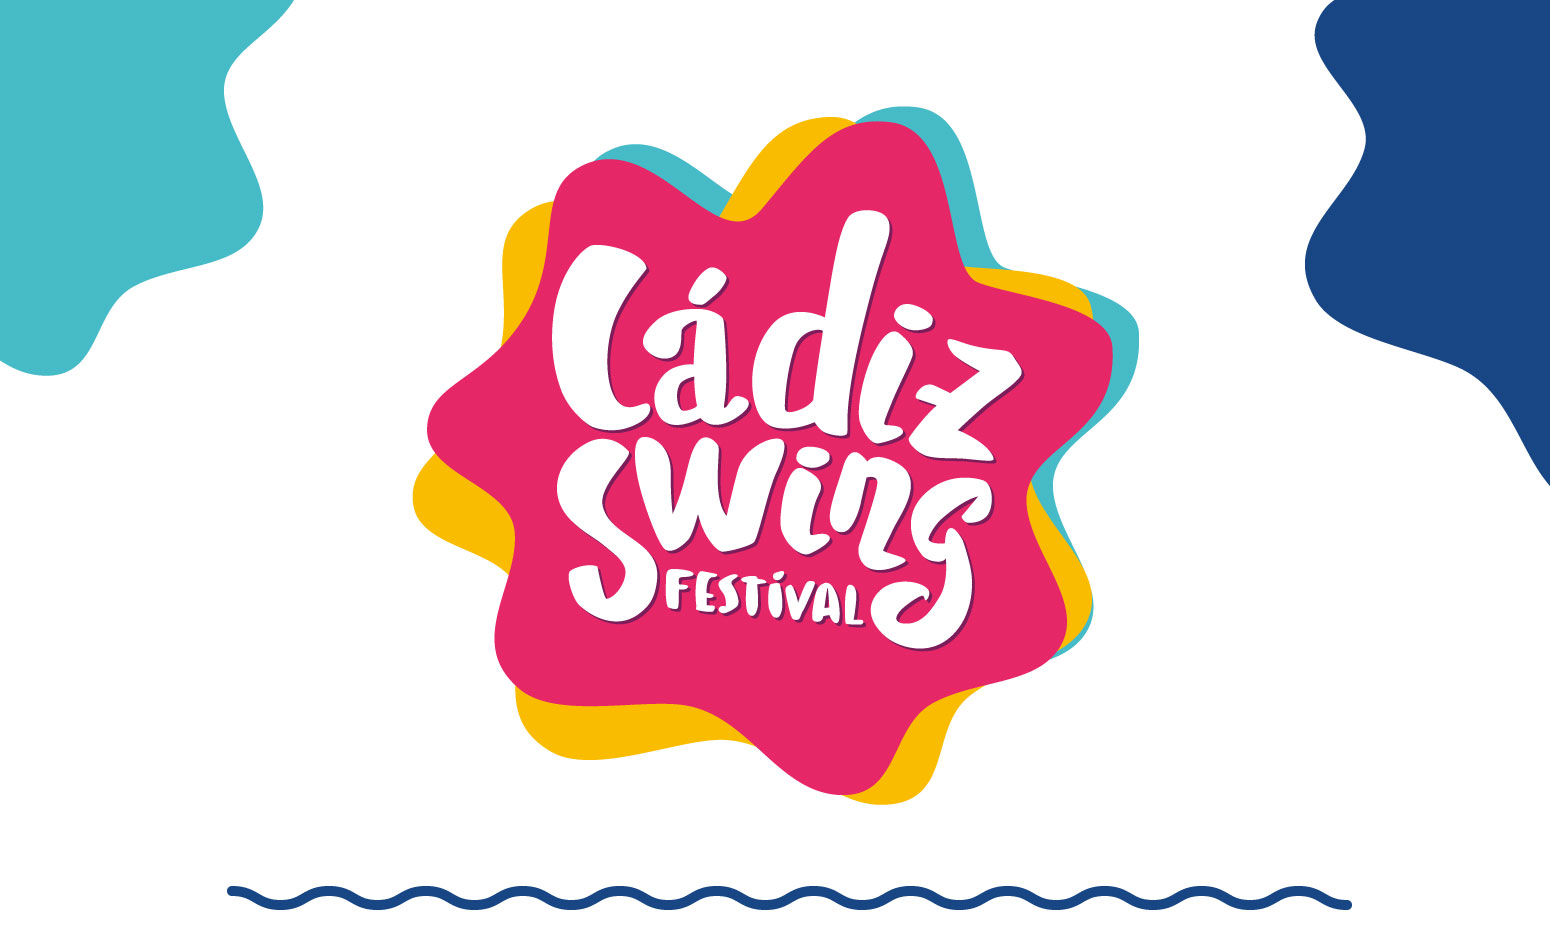 Cadiz Swing Festival